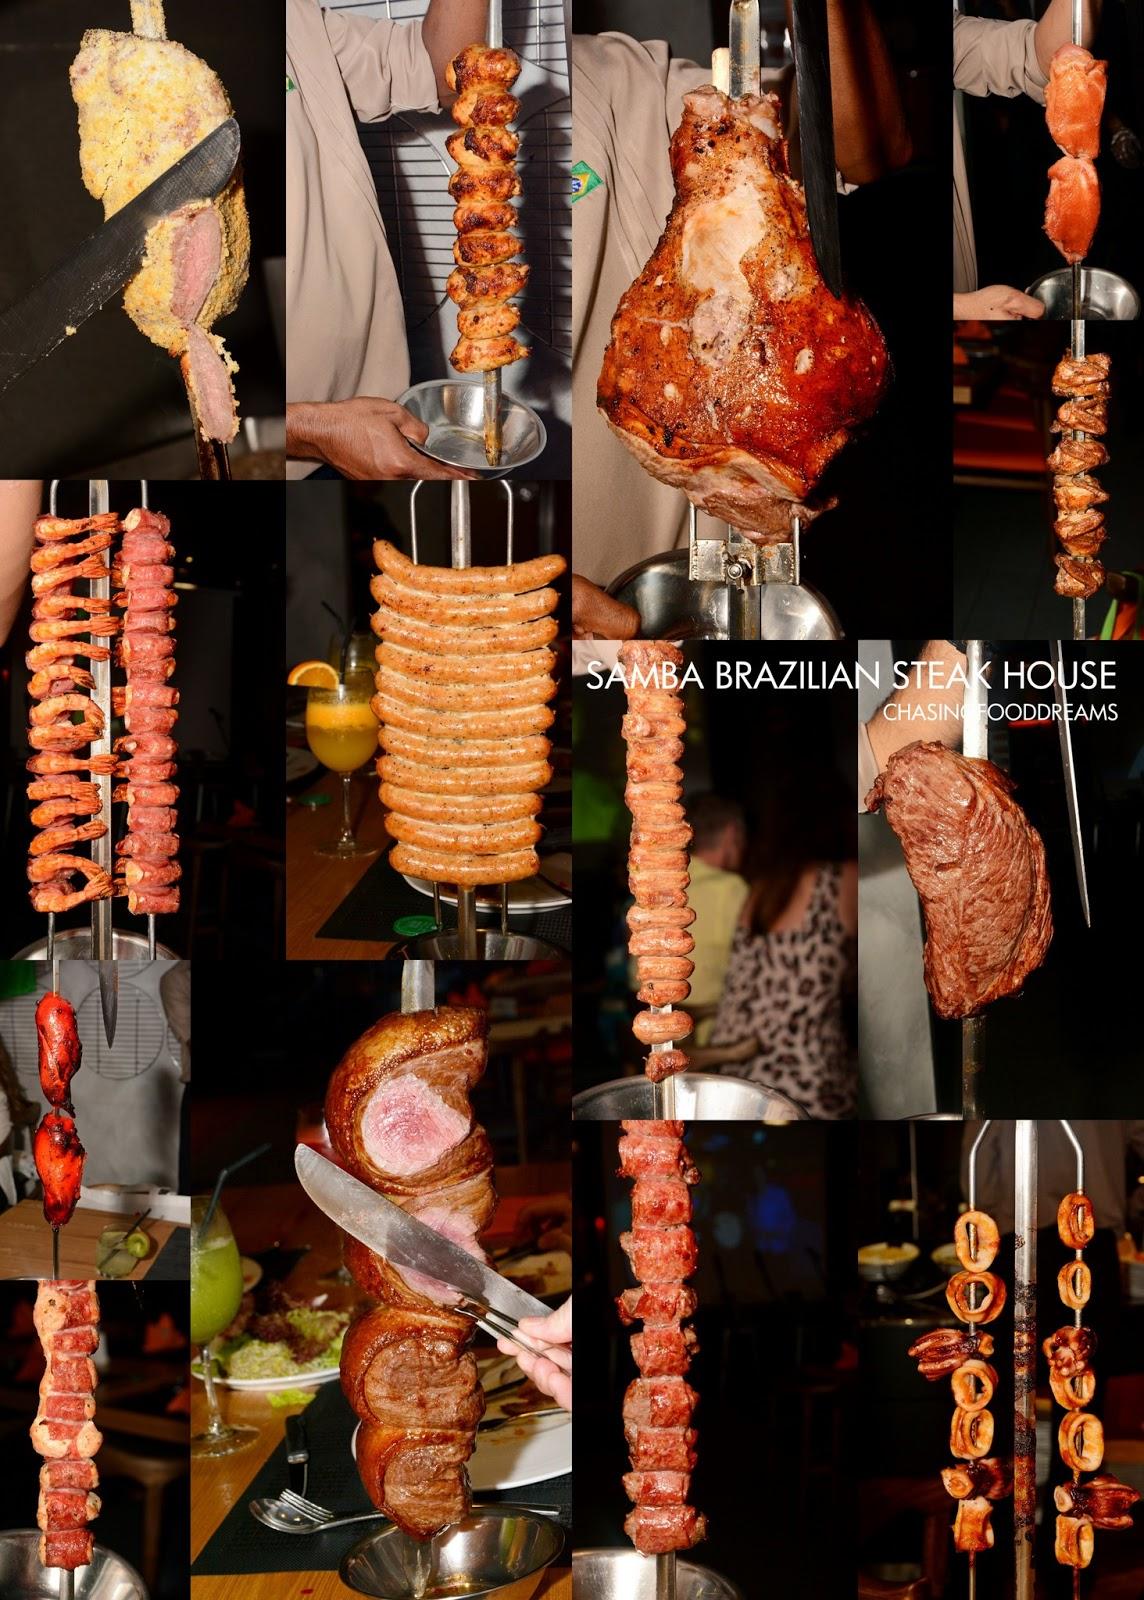 Chasing food dreams samba brazilian steak house for Samba buffet